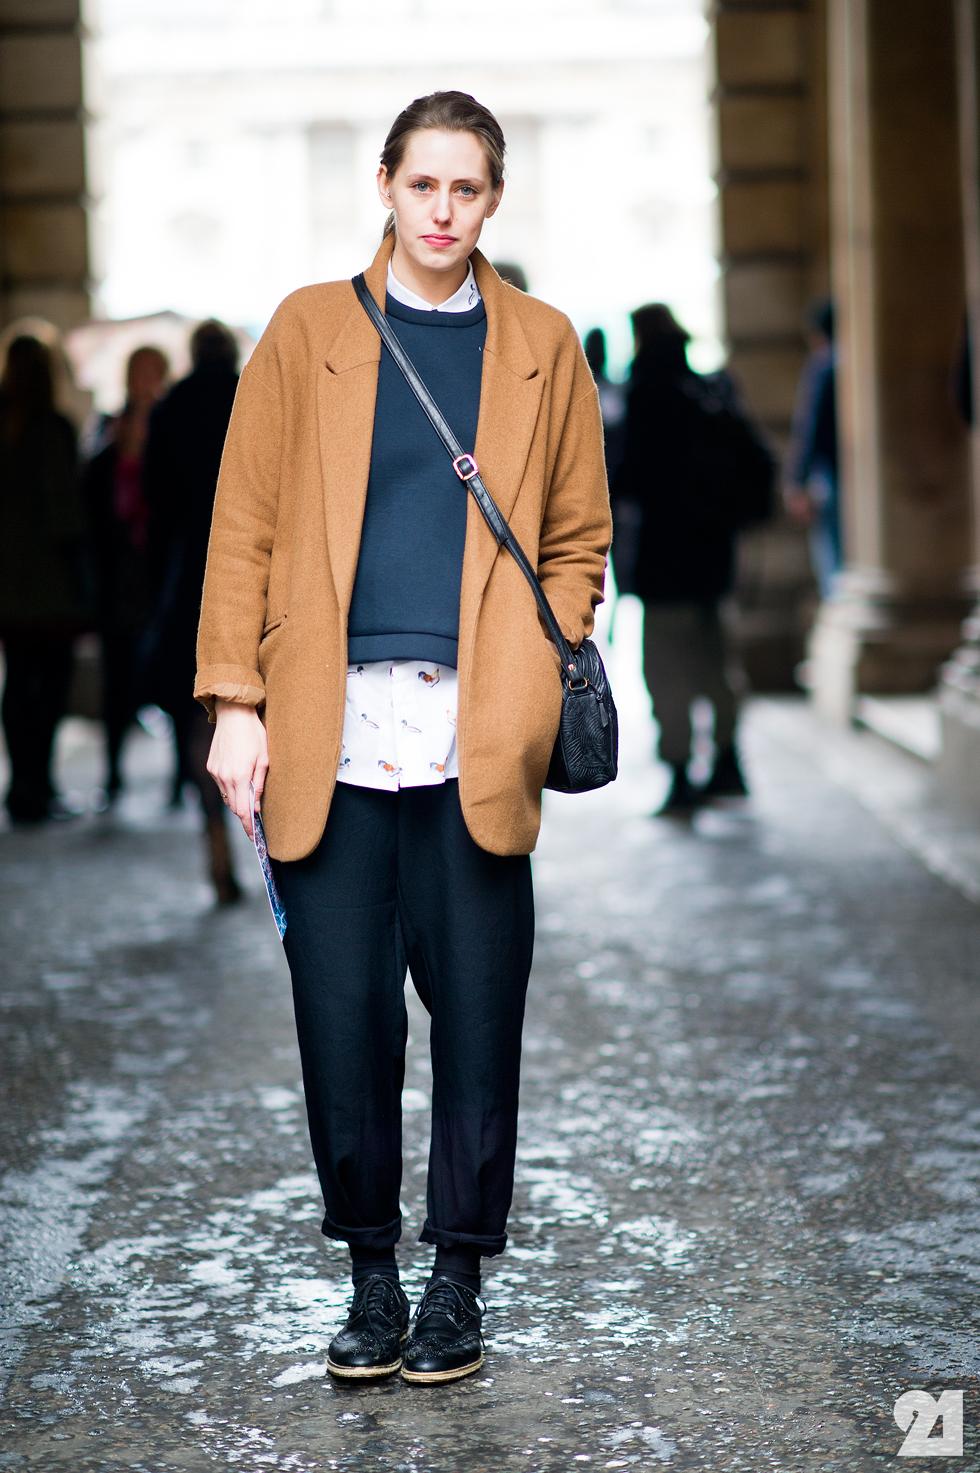 1918-Le-21eme-Adam-Katz-Sinding-Georgia-Smith-Vodafone-London-Fashion-Week-Fall-Winter-2012-2013-New-York-City-Street-Style-Fashion-Blog_21E6104